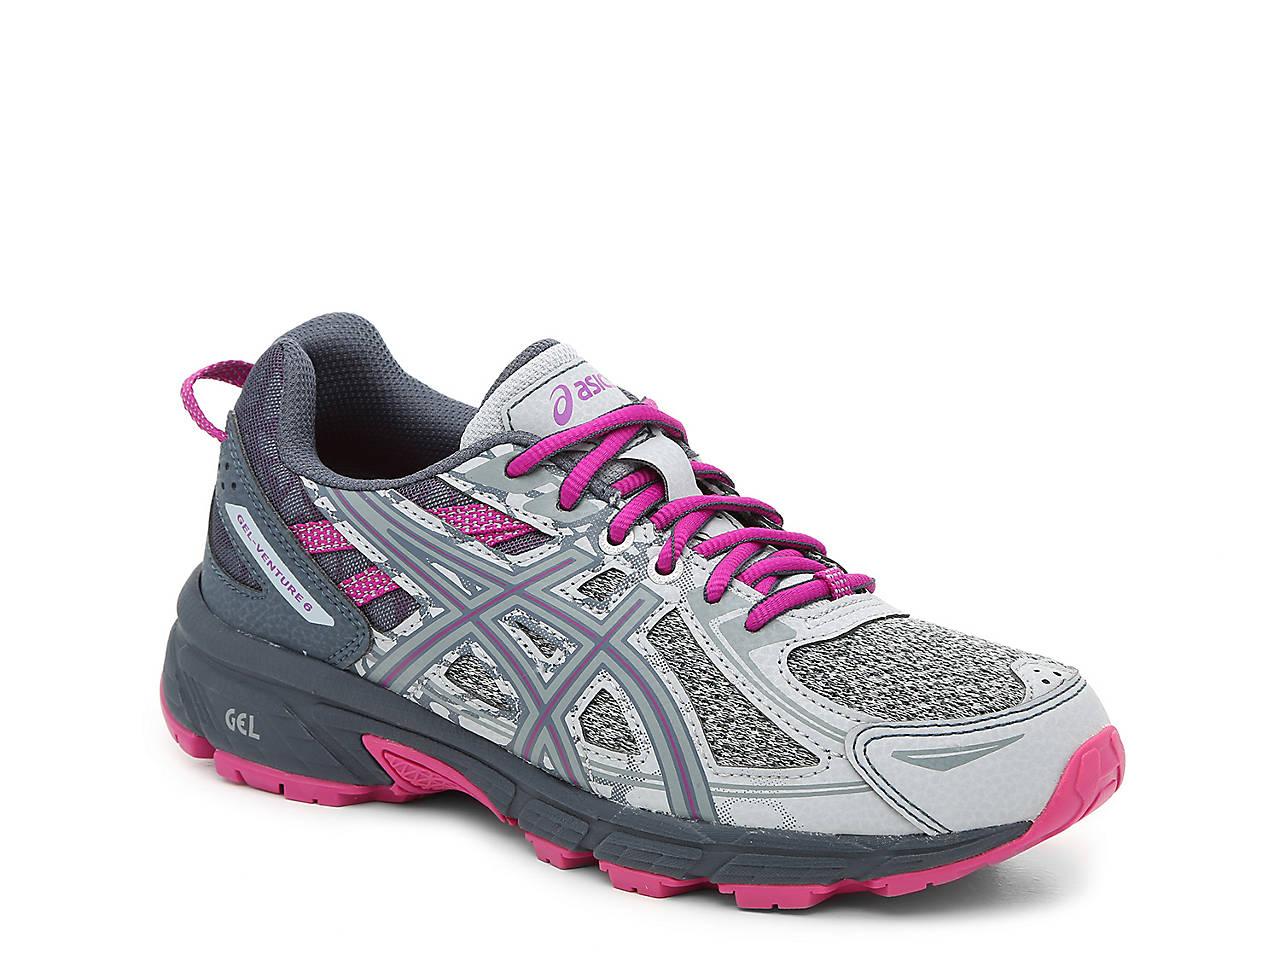 ASICS GEL-Venture 6 Running Shoe - Women s Women s Shoes  71efa2036